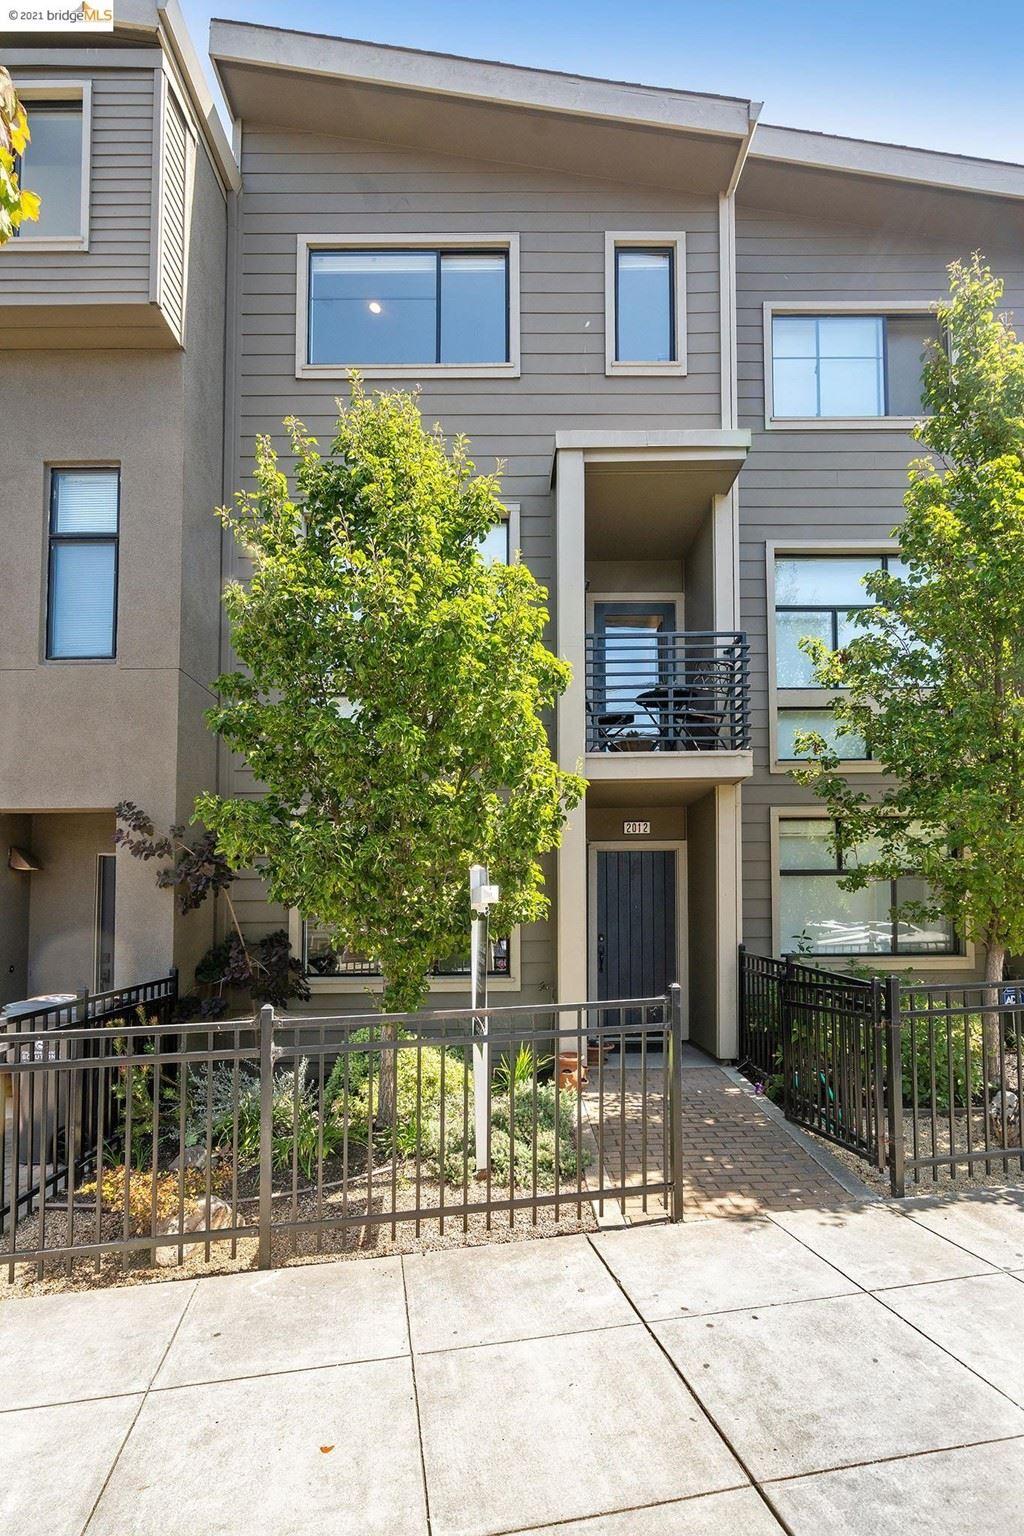 2012 Market St, Oakland, CA 94607 - MLS#: 40965615